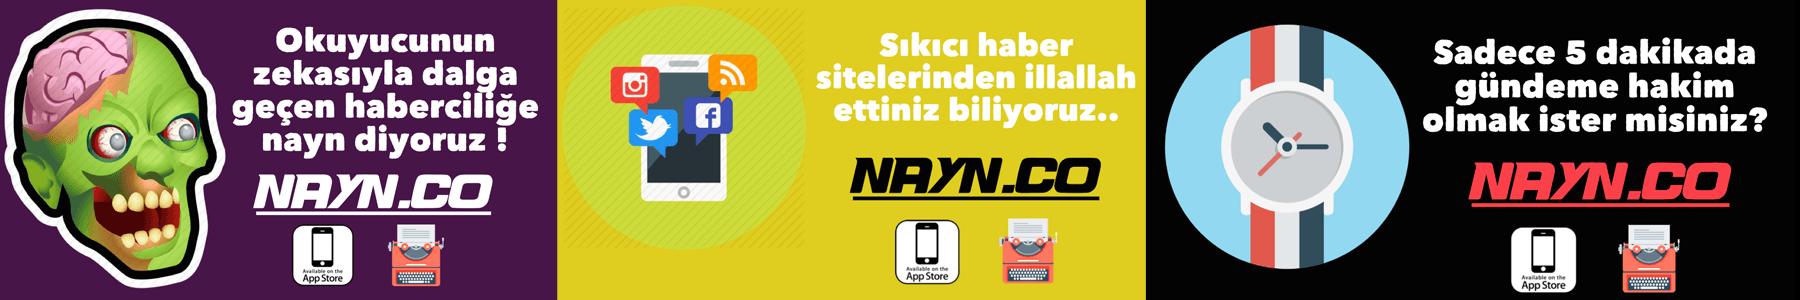 naynco-poster